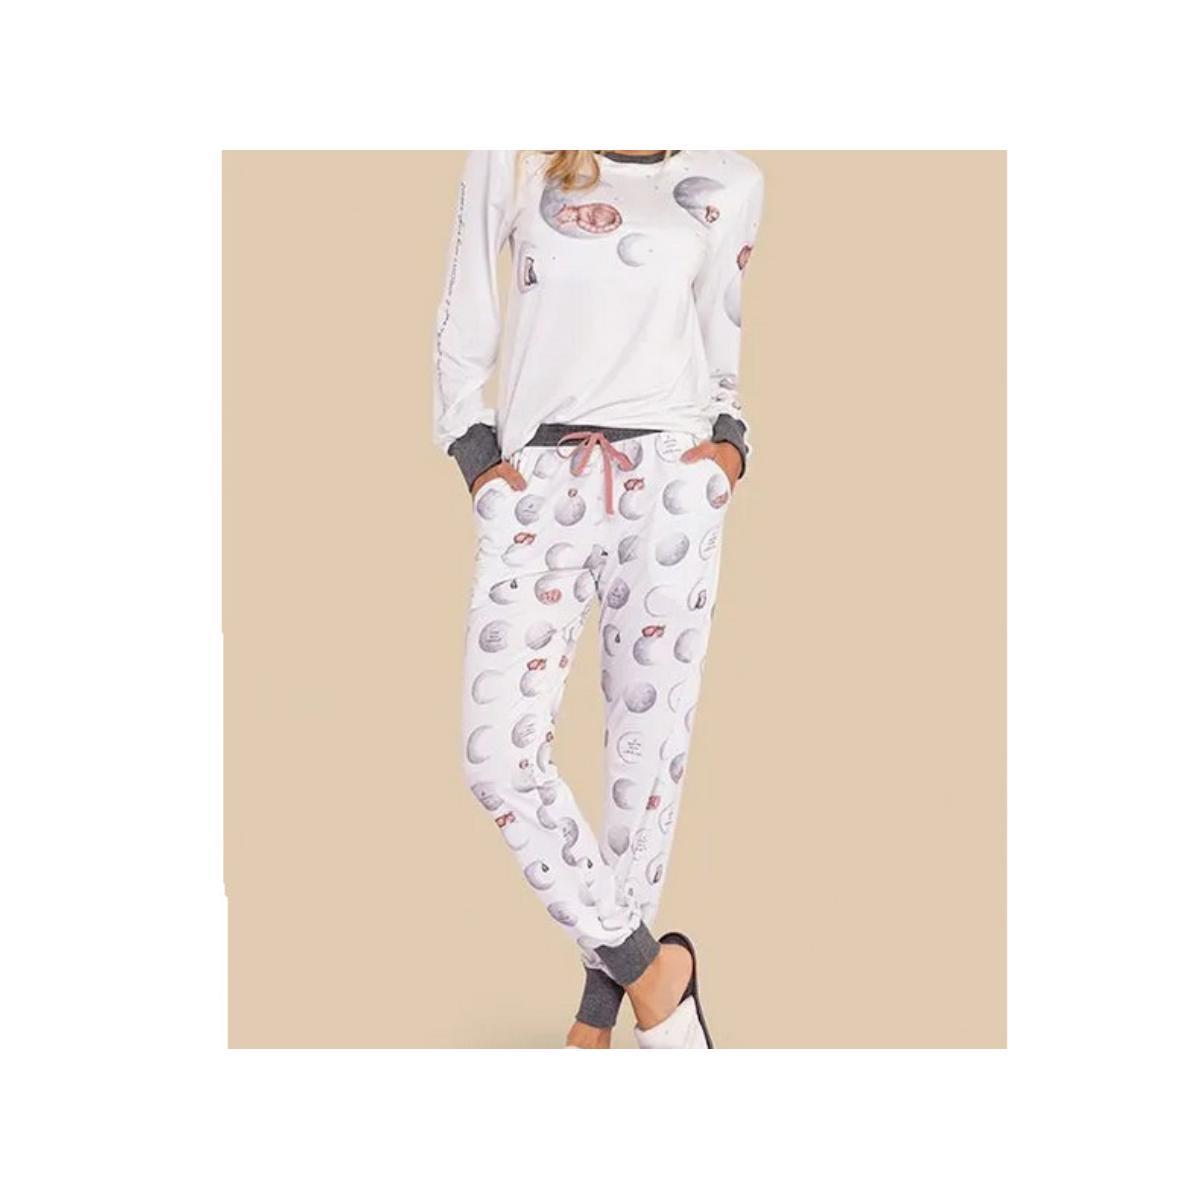 Pijama Feminina Lua Lua 420175 Branco/mescla